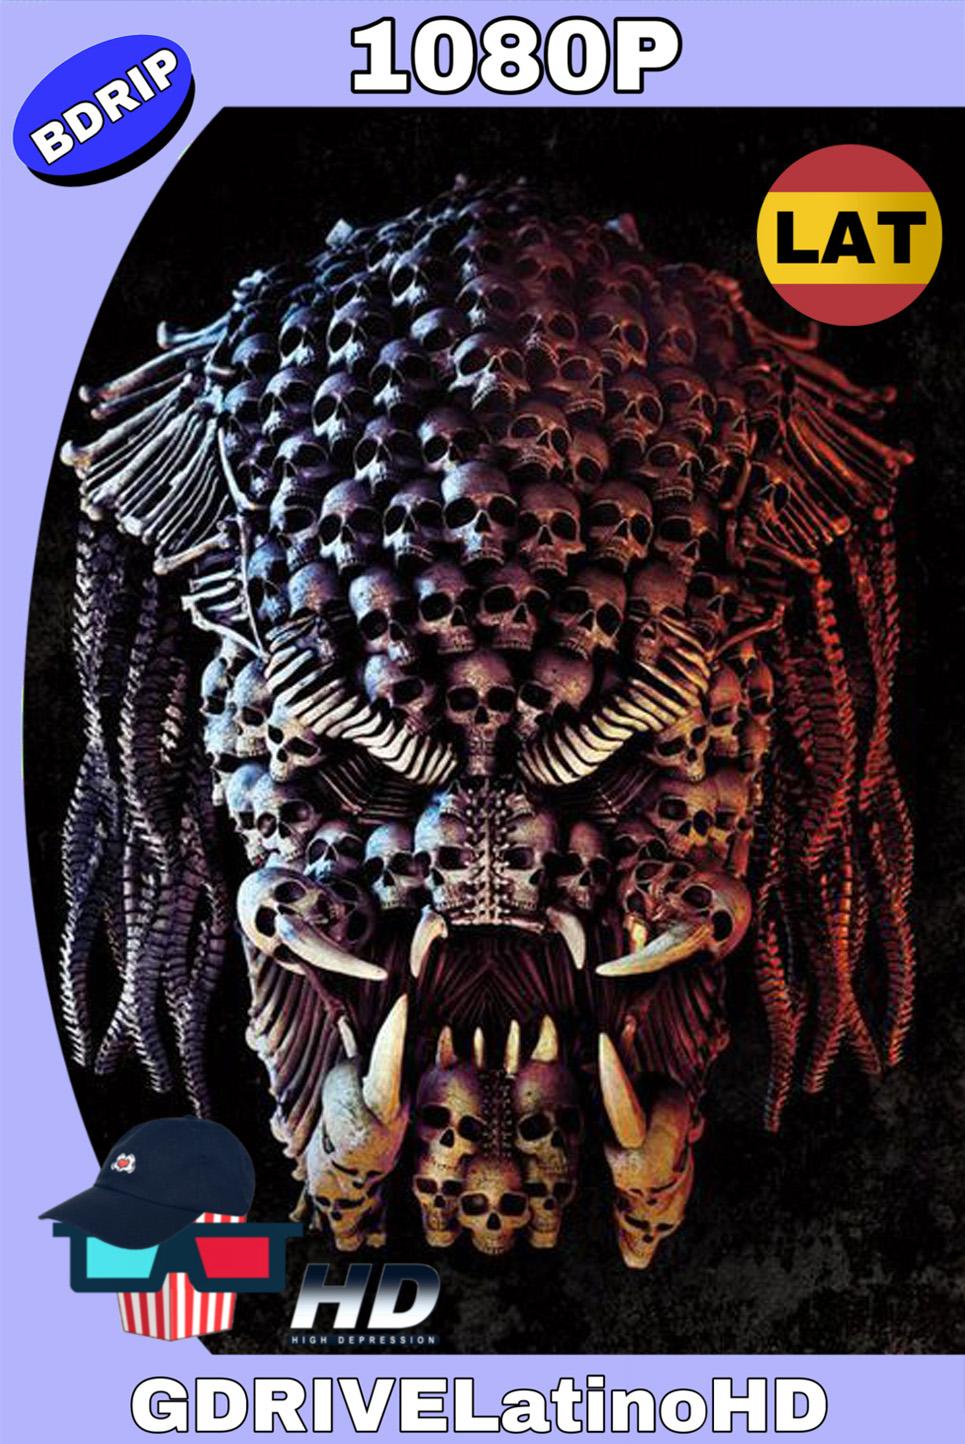 El Depredador (2018) BDRIP 1080p (60 FPS) Latino Inglés MKV